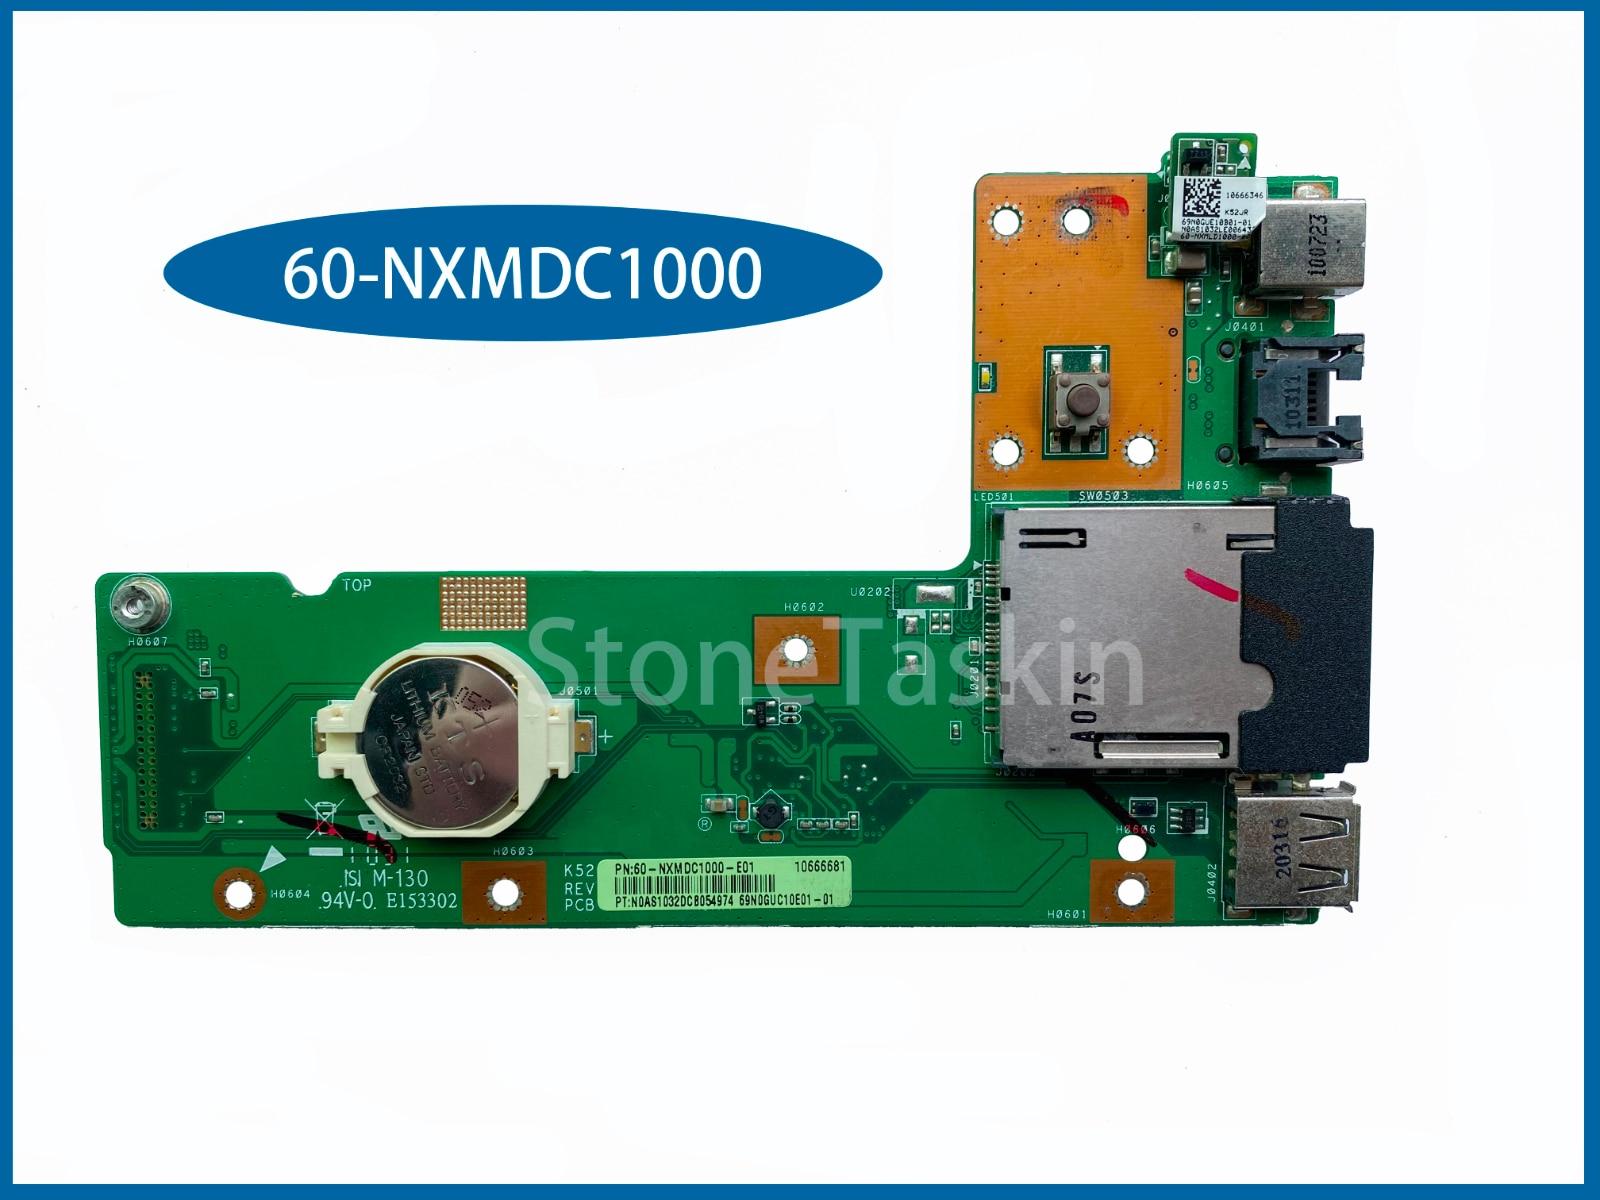 Hohe qualität Laptop Kabel Für ASUS K52 K52J K52JR K52JC K52DR X52F K52F X52J USB DC 60-NXMDC1000 Board Connector Voll getestet